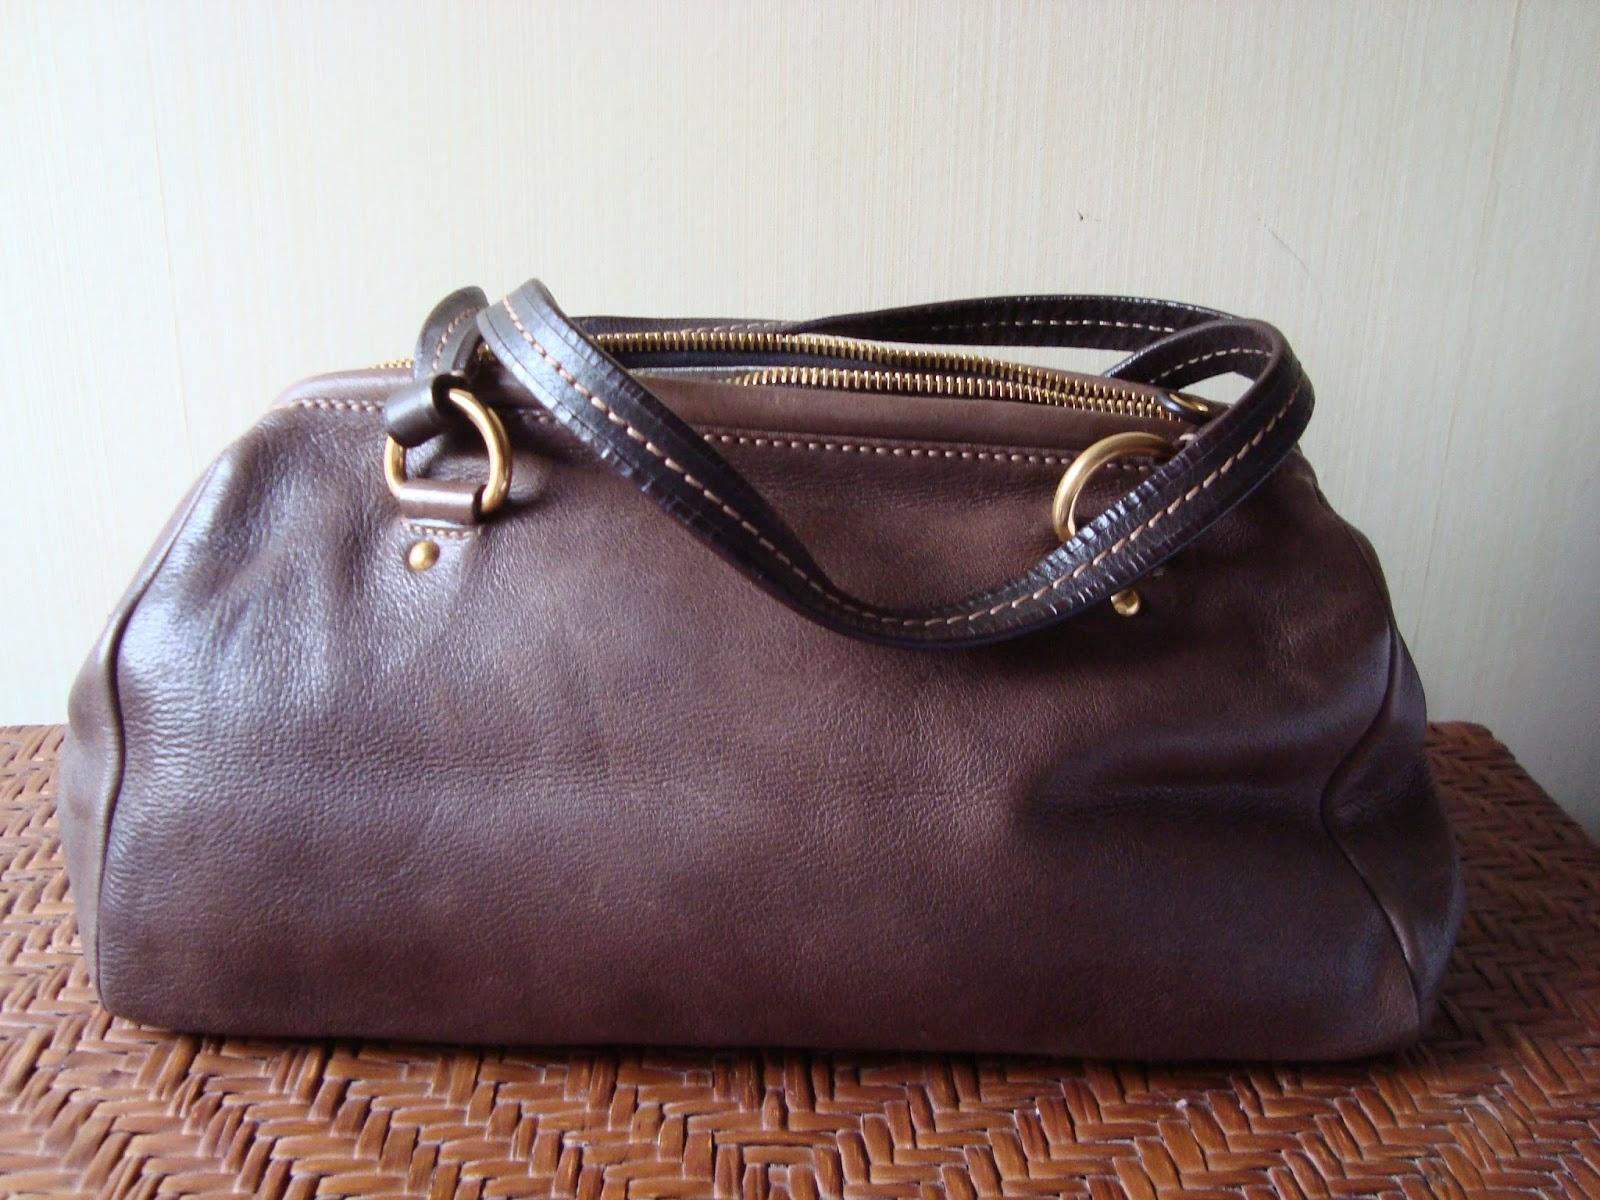 Car Shoe: Prada Dark Brown Leather Handbag